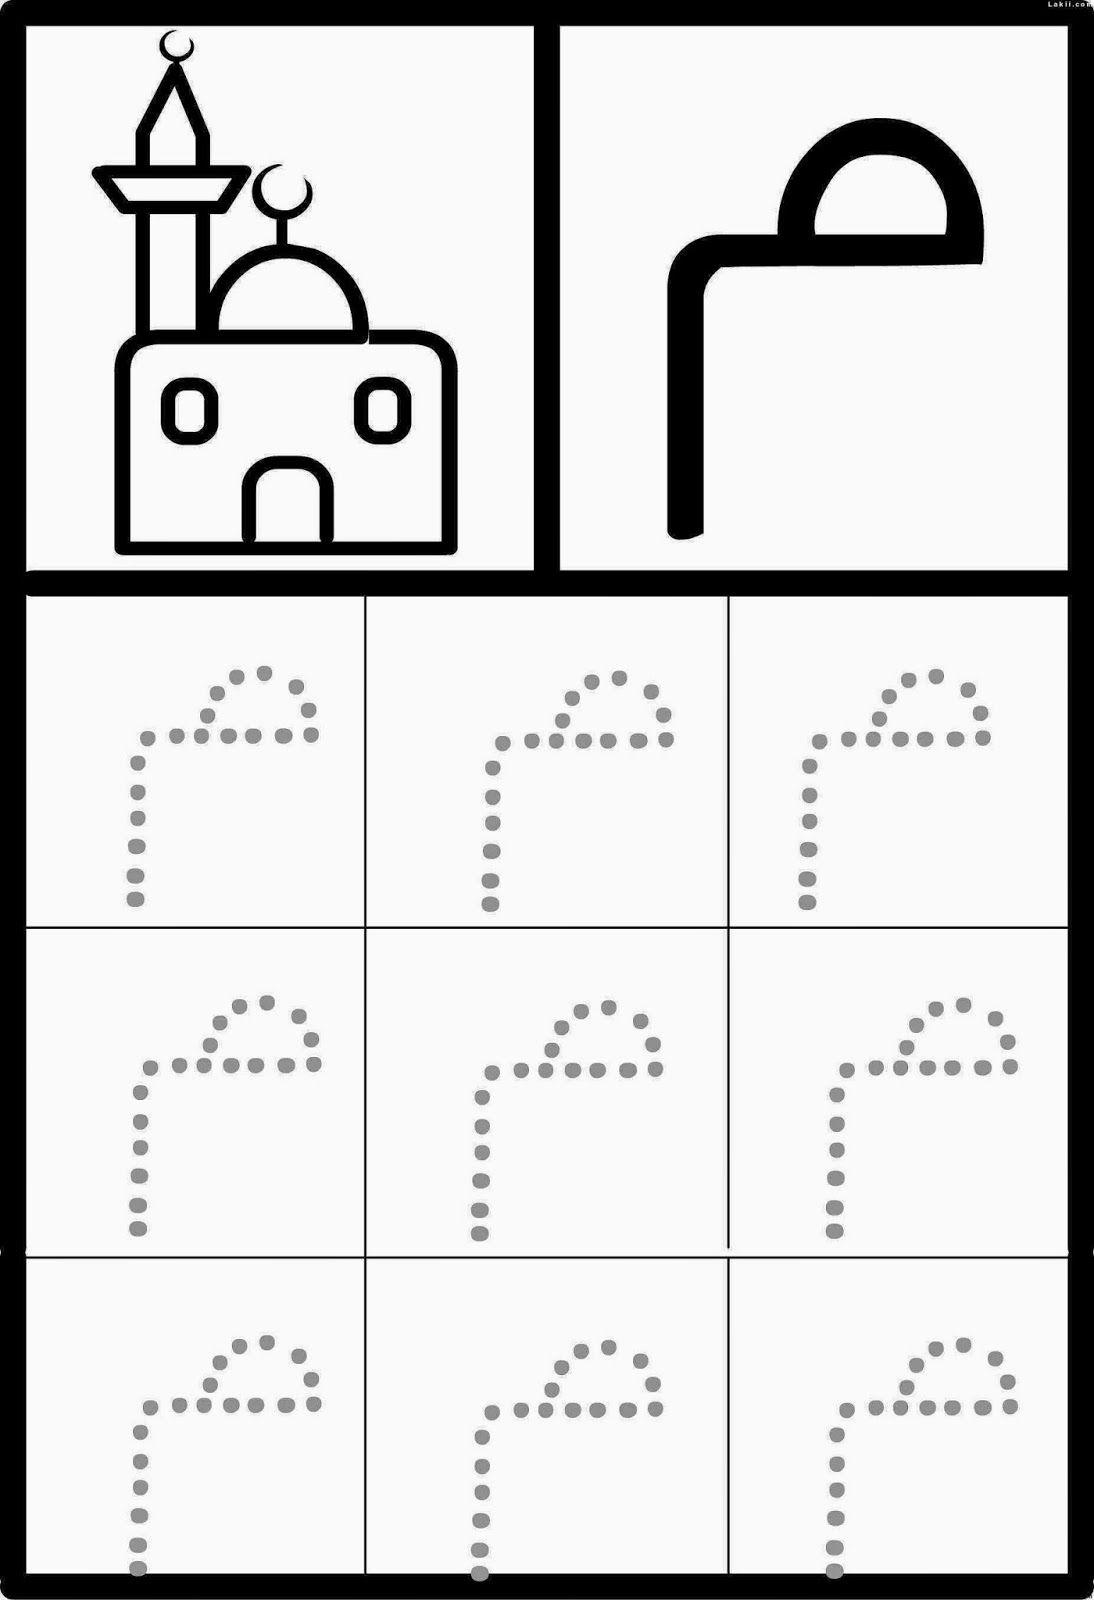 Arabic Handwriting Worksheets Slide 22 Arabic Handwriting Arabic Alphabet Arabic Alphabet For Kids